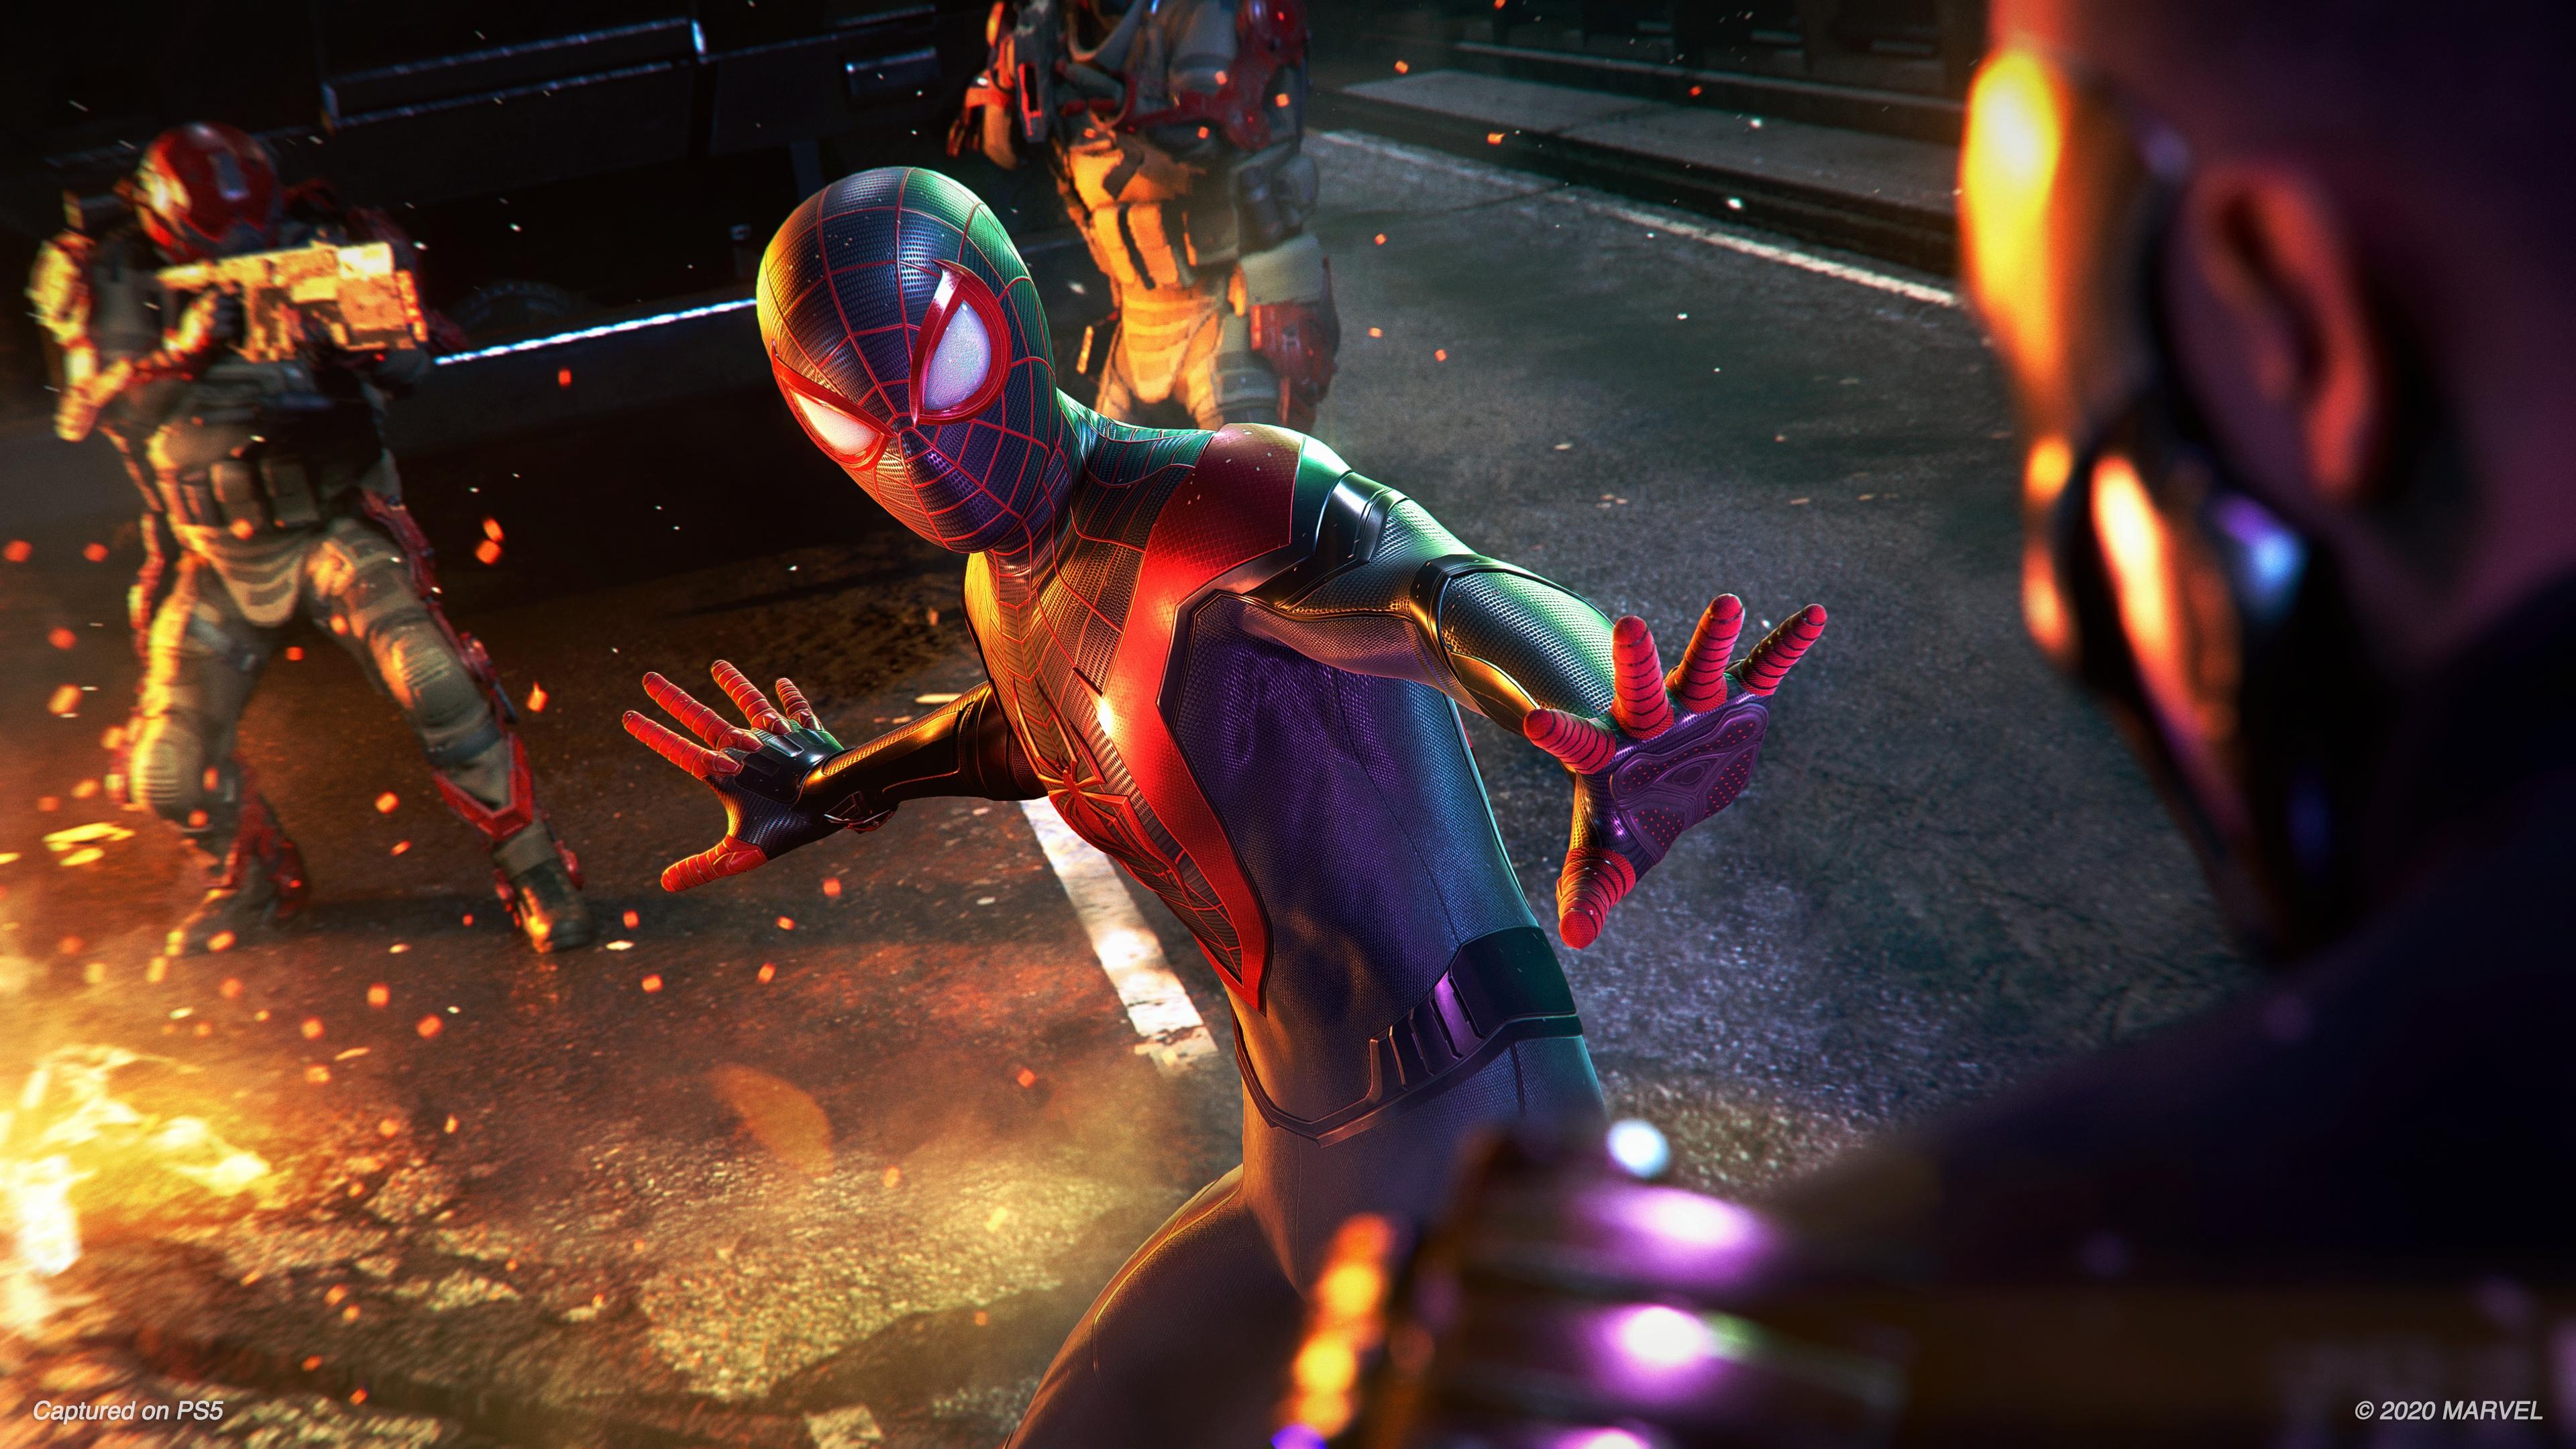 Marvel S Spider Man Miles Morales 4k Wallpaper 2020 Games Playstation 5 Games 2696